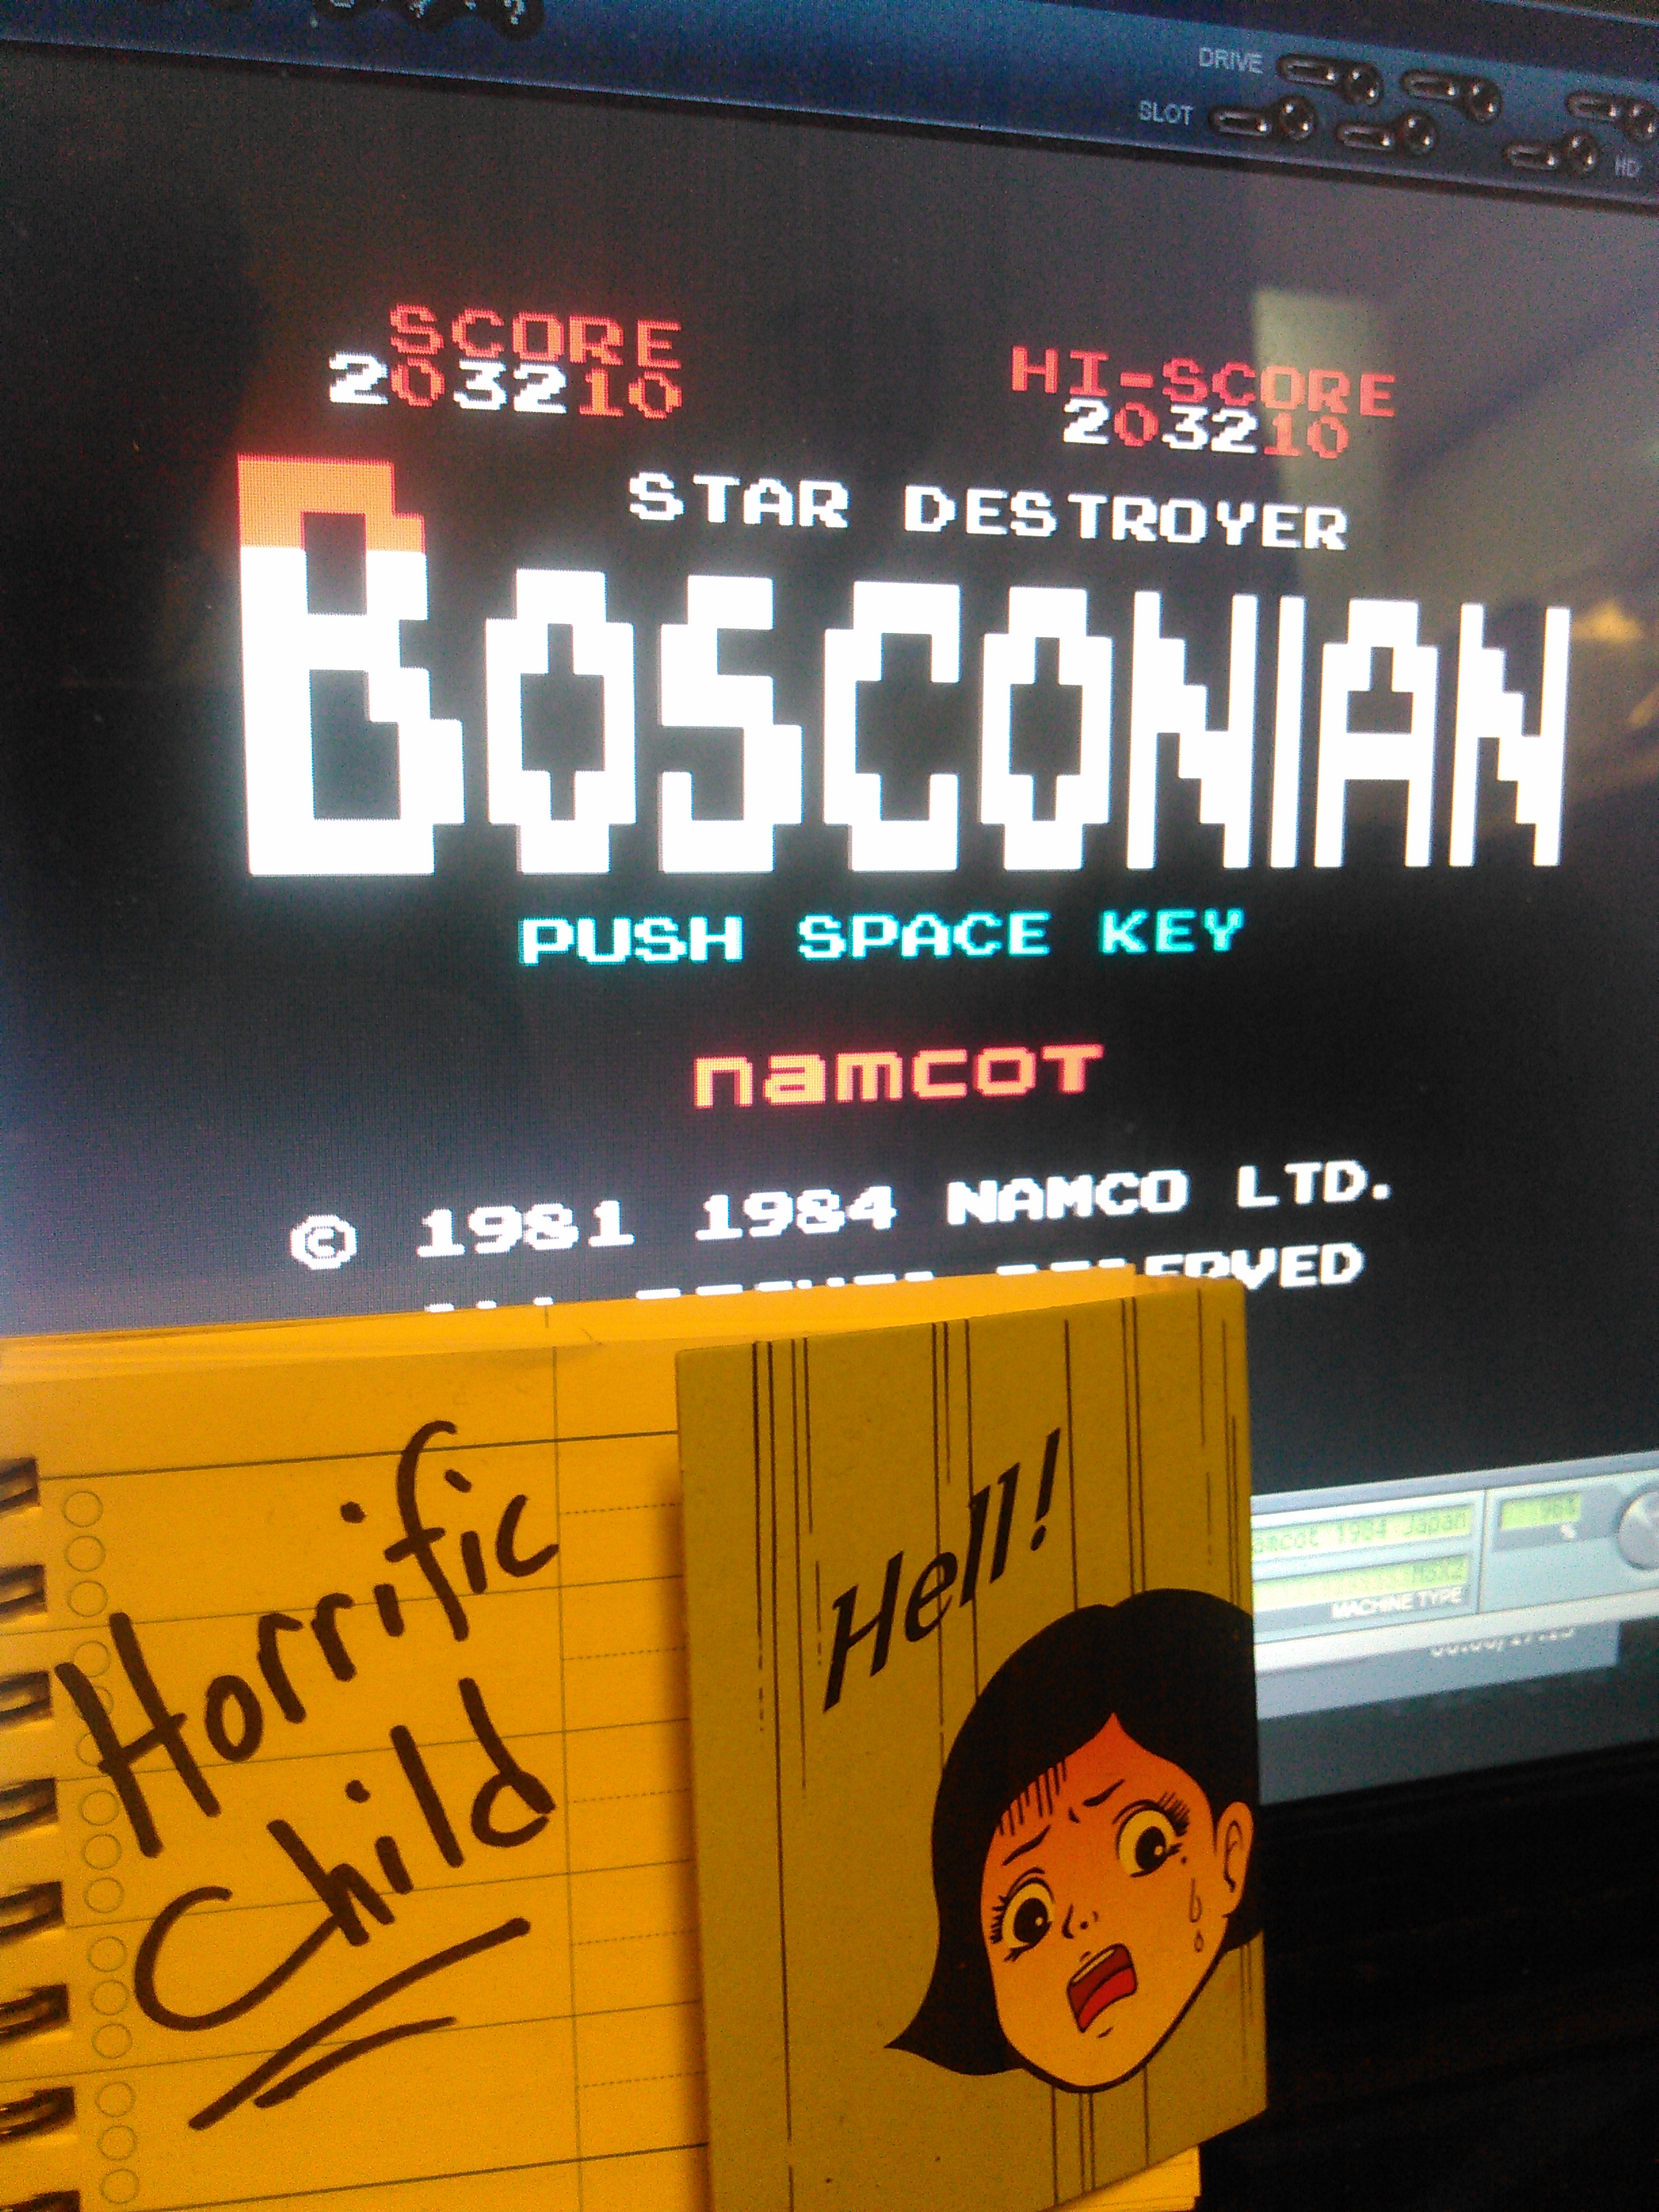 HorrificChild: Bosconian (MSX Emulated) 203,210 points on 2018-02-23 07:41:47